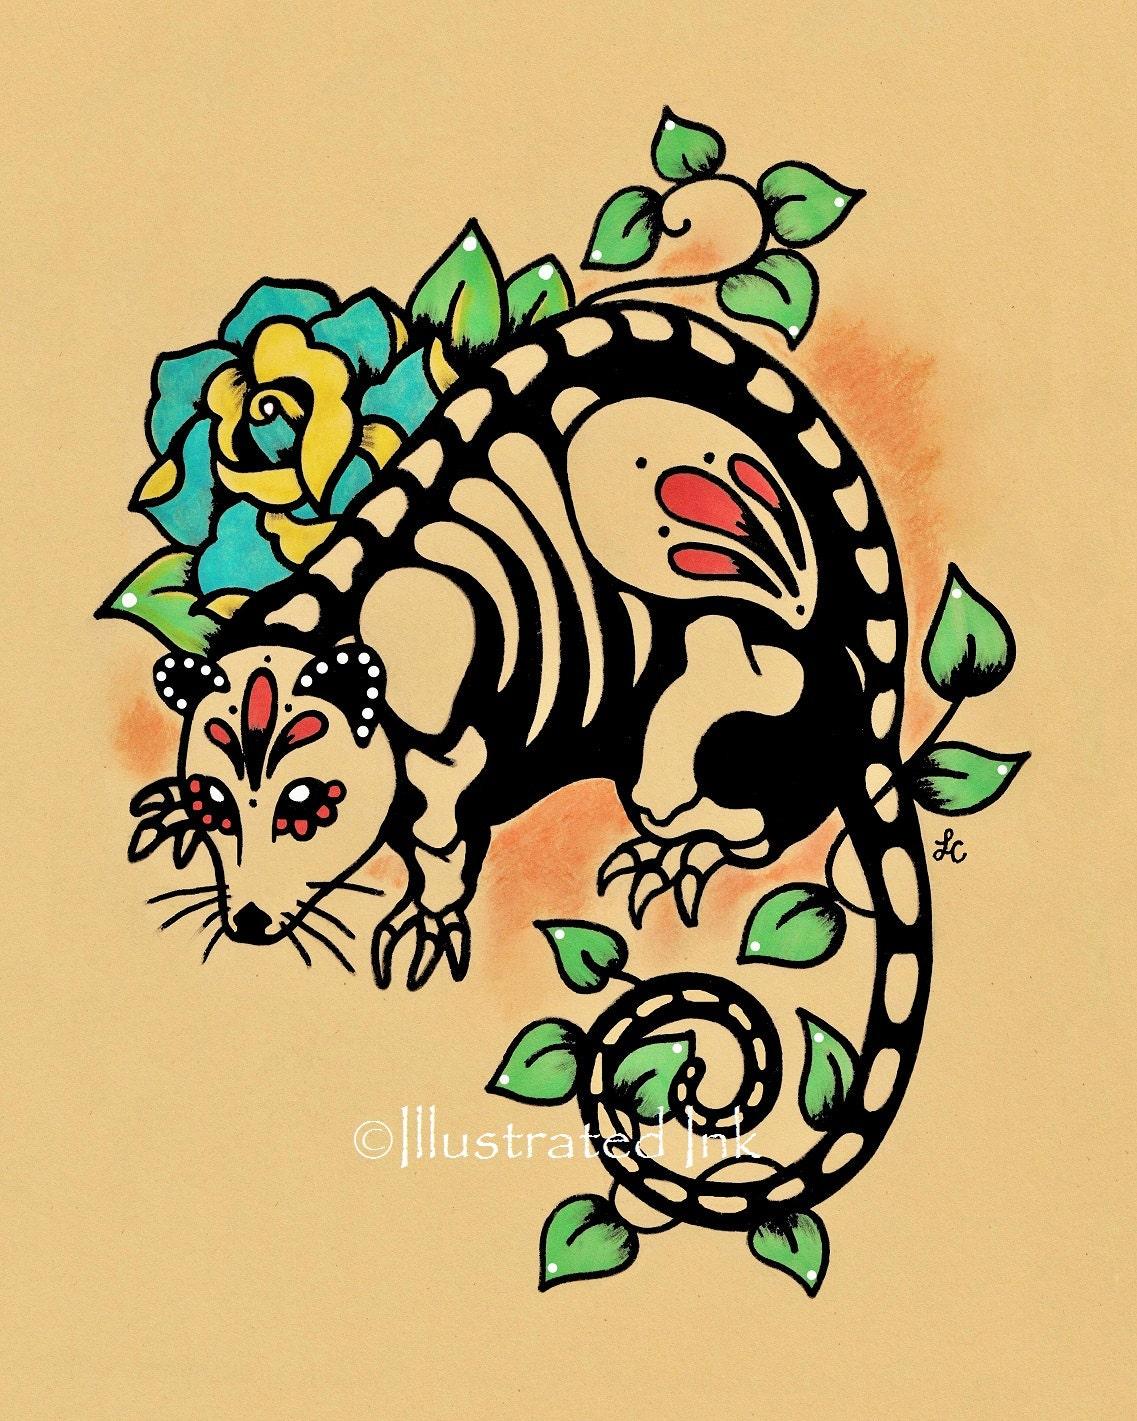 day of the dead possum mexican folk art dia de los muertos. Black Bedroom Furniture Sets. Home Design Ideas